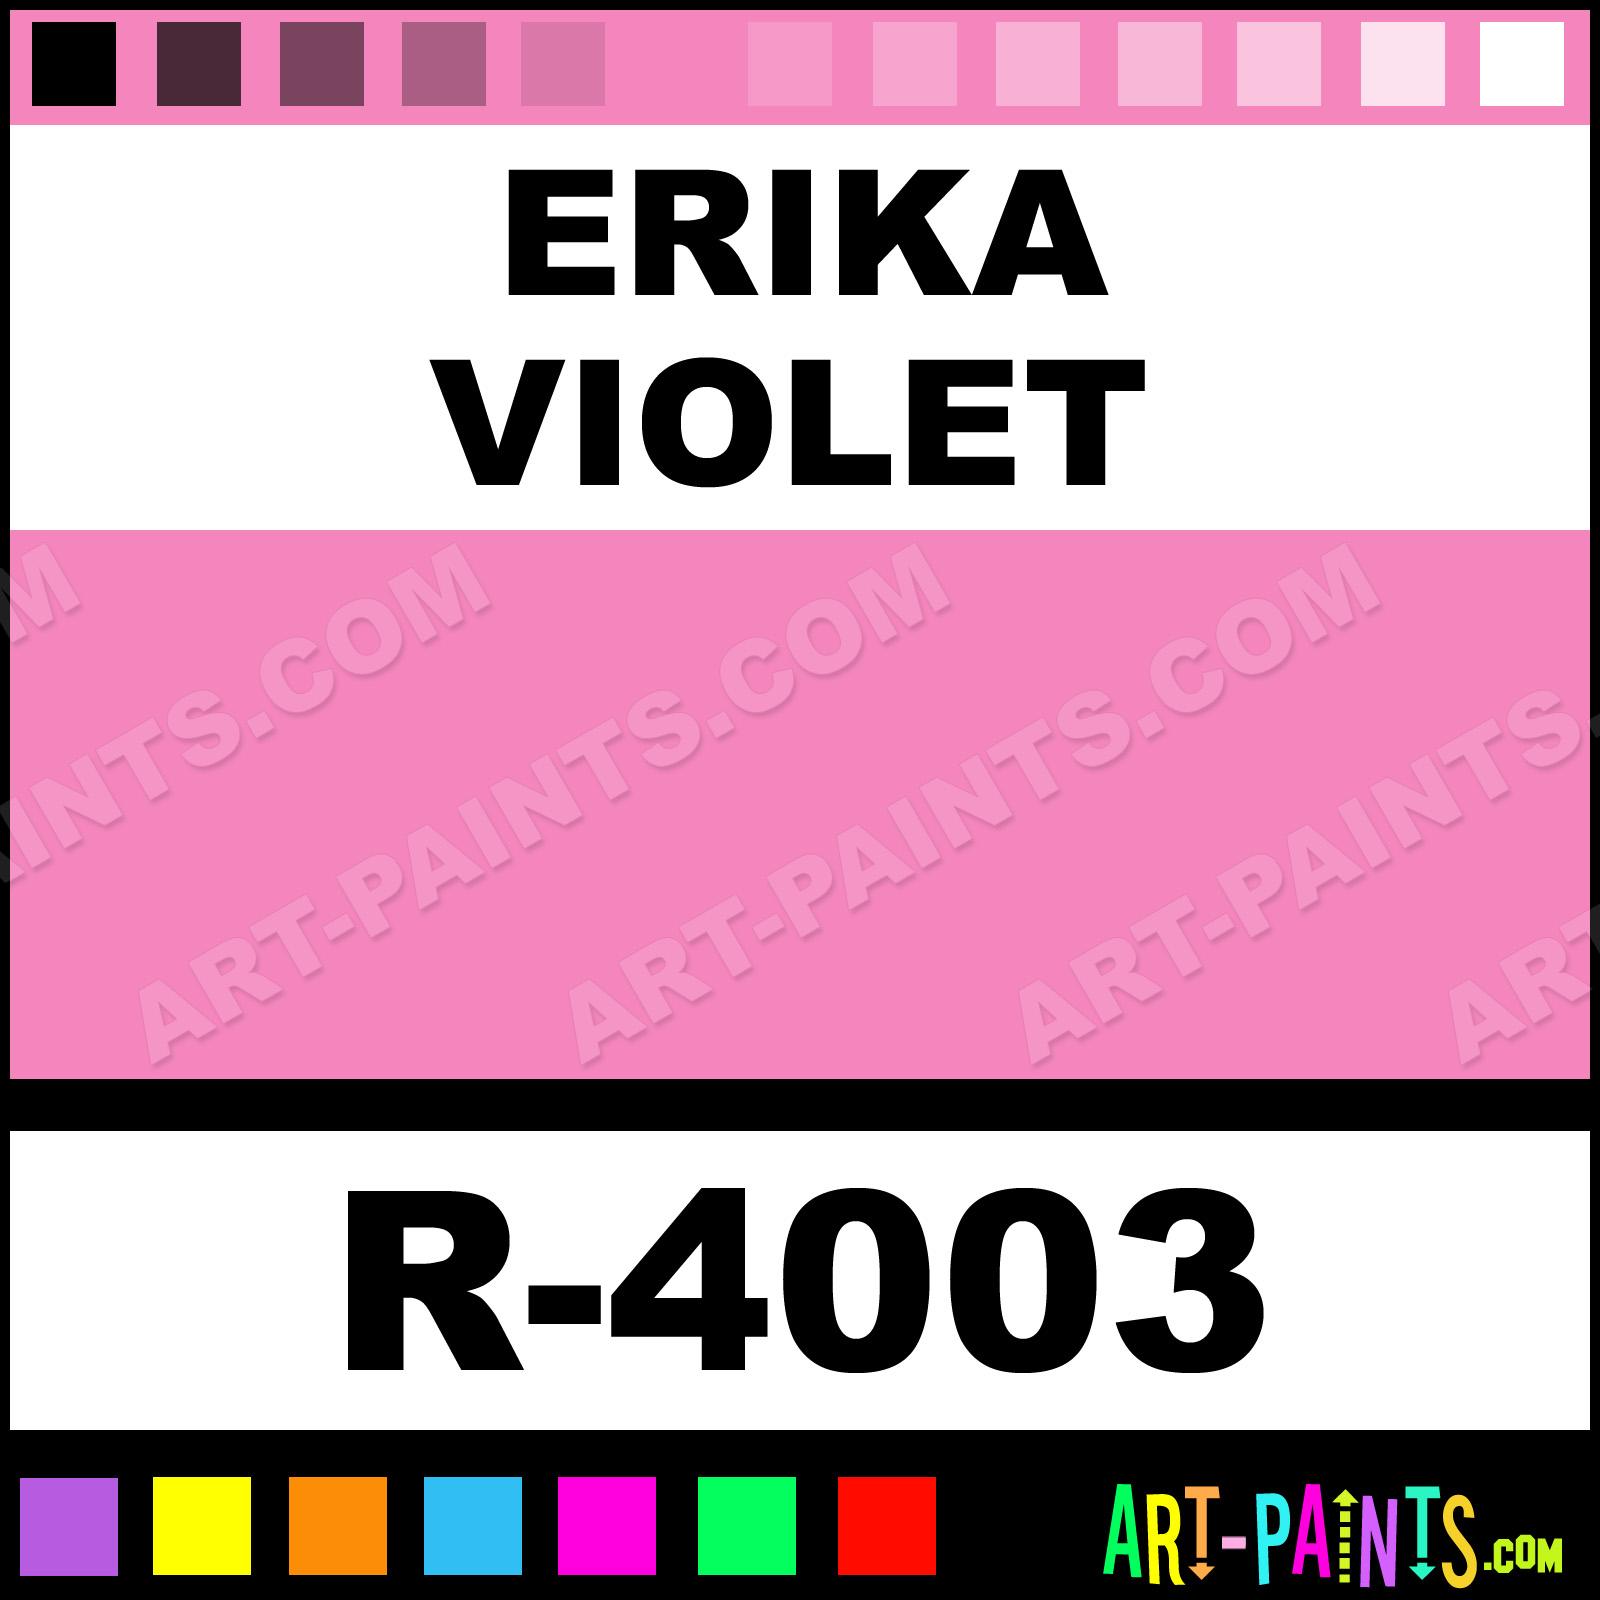 Erika violet aerosol spray paints aerosol decorative paints r erika violet nvjuhfo Choice Image